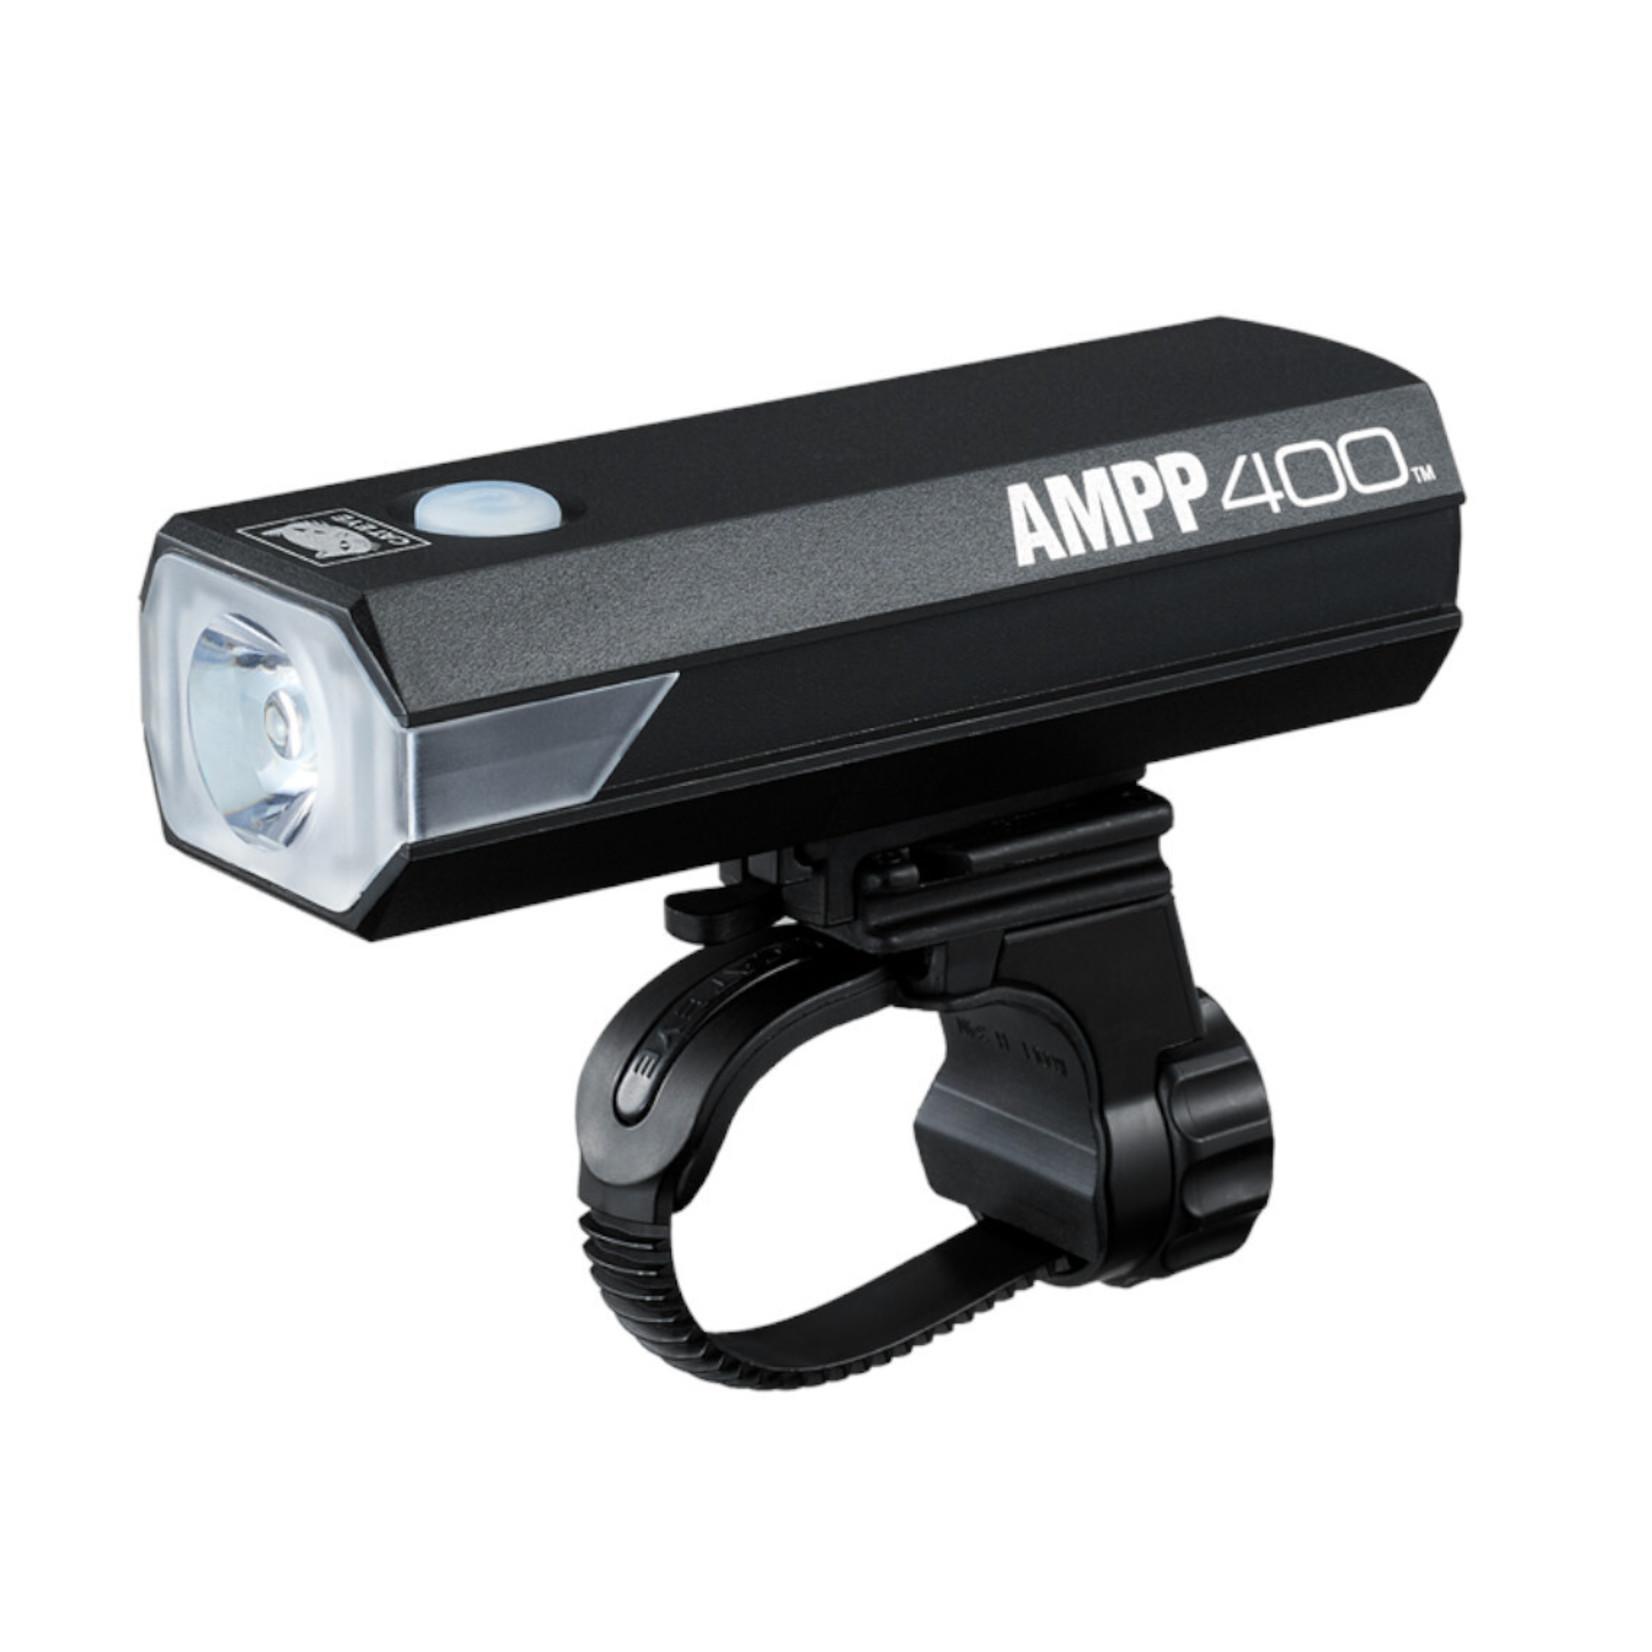 Cateye Cateye, Light Front Ampp 400 Black